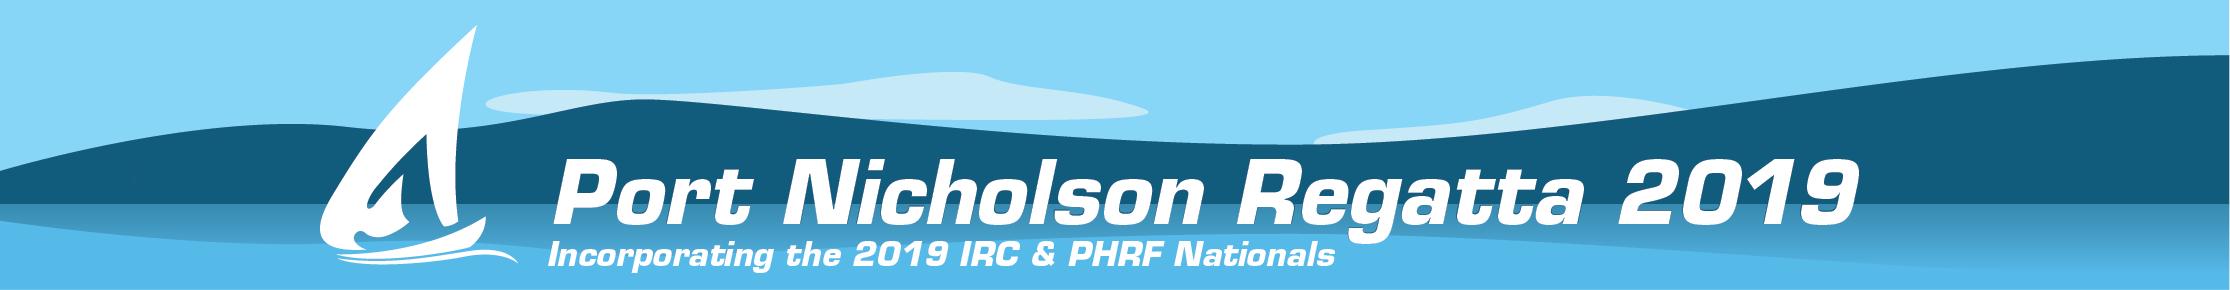 Port Nicholson Regatta